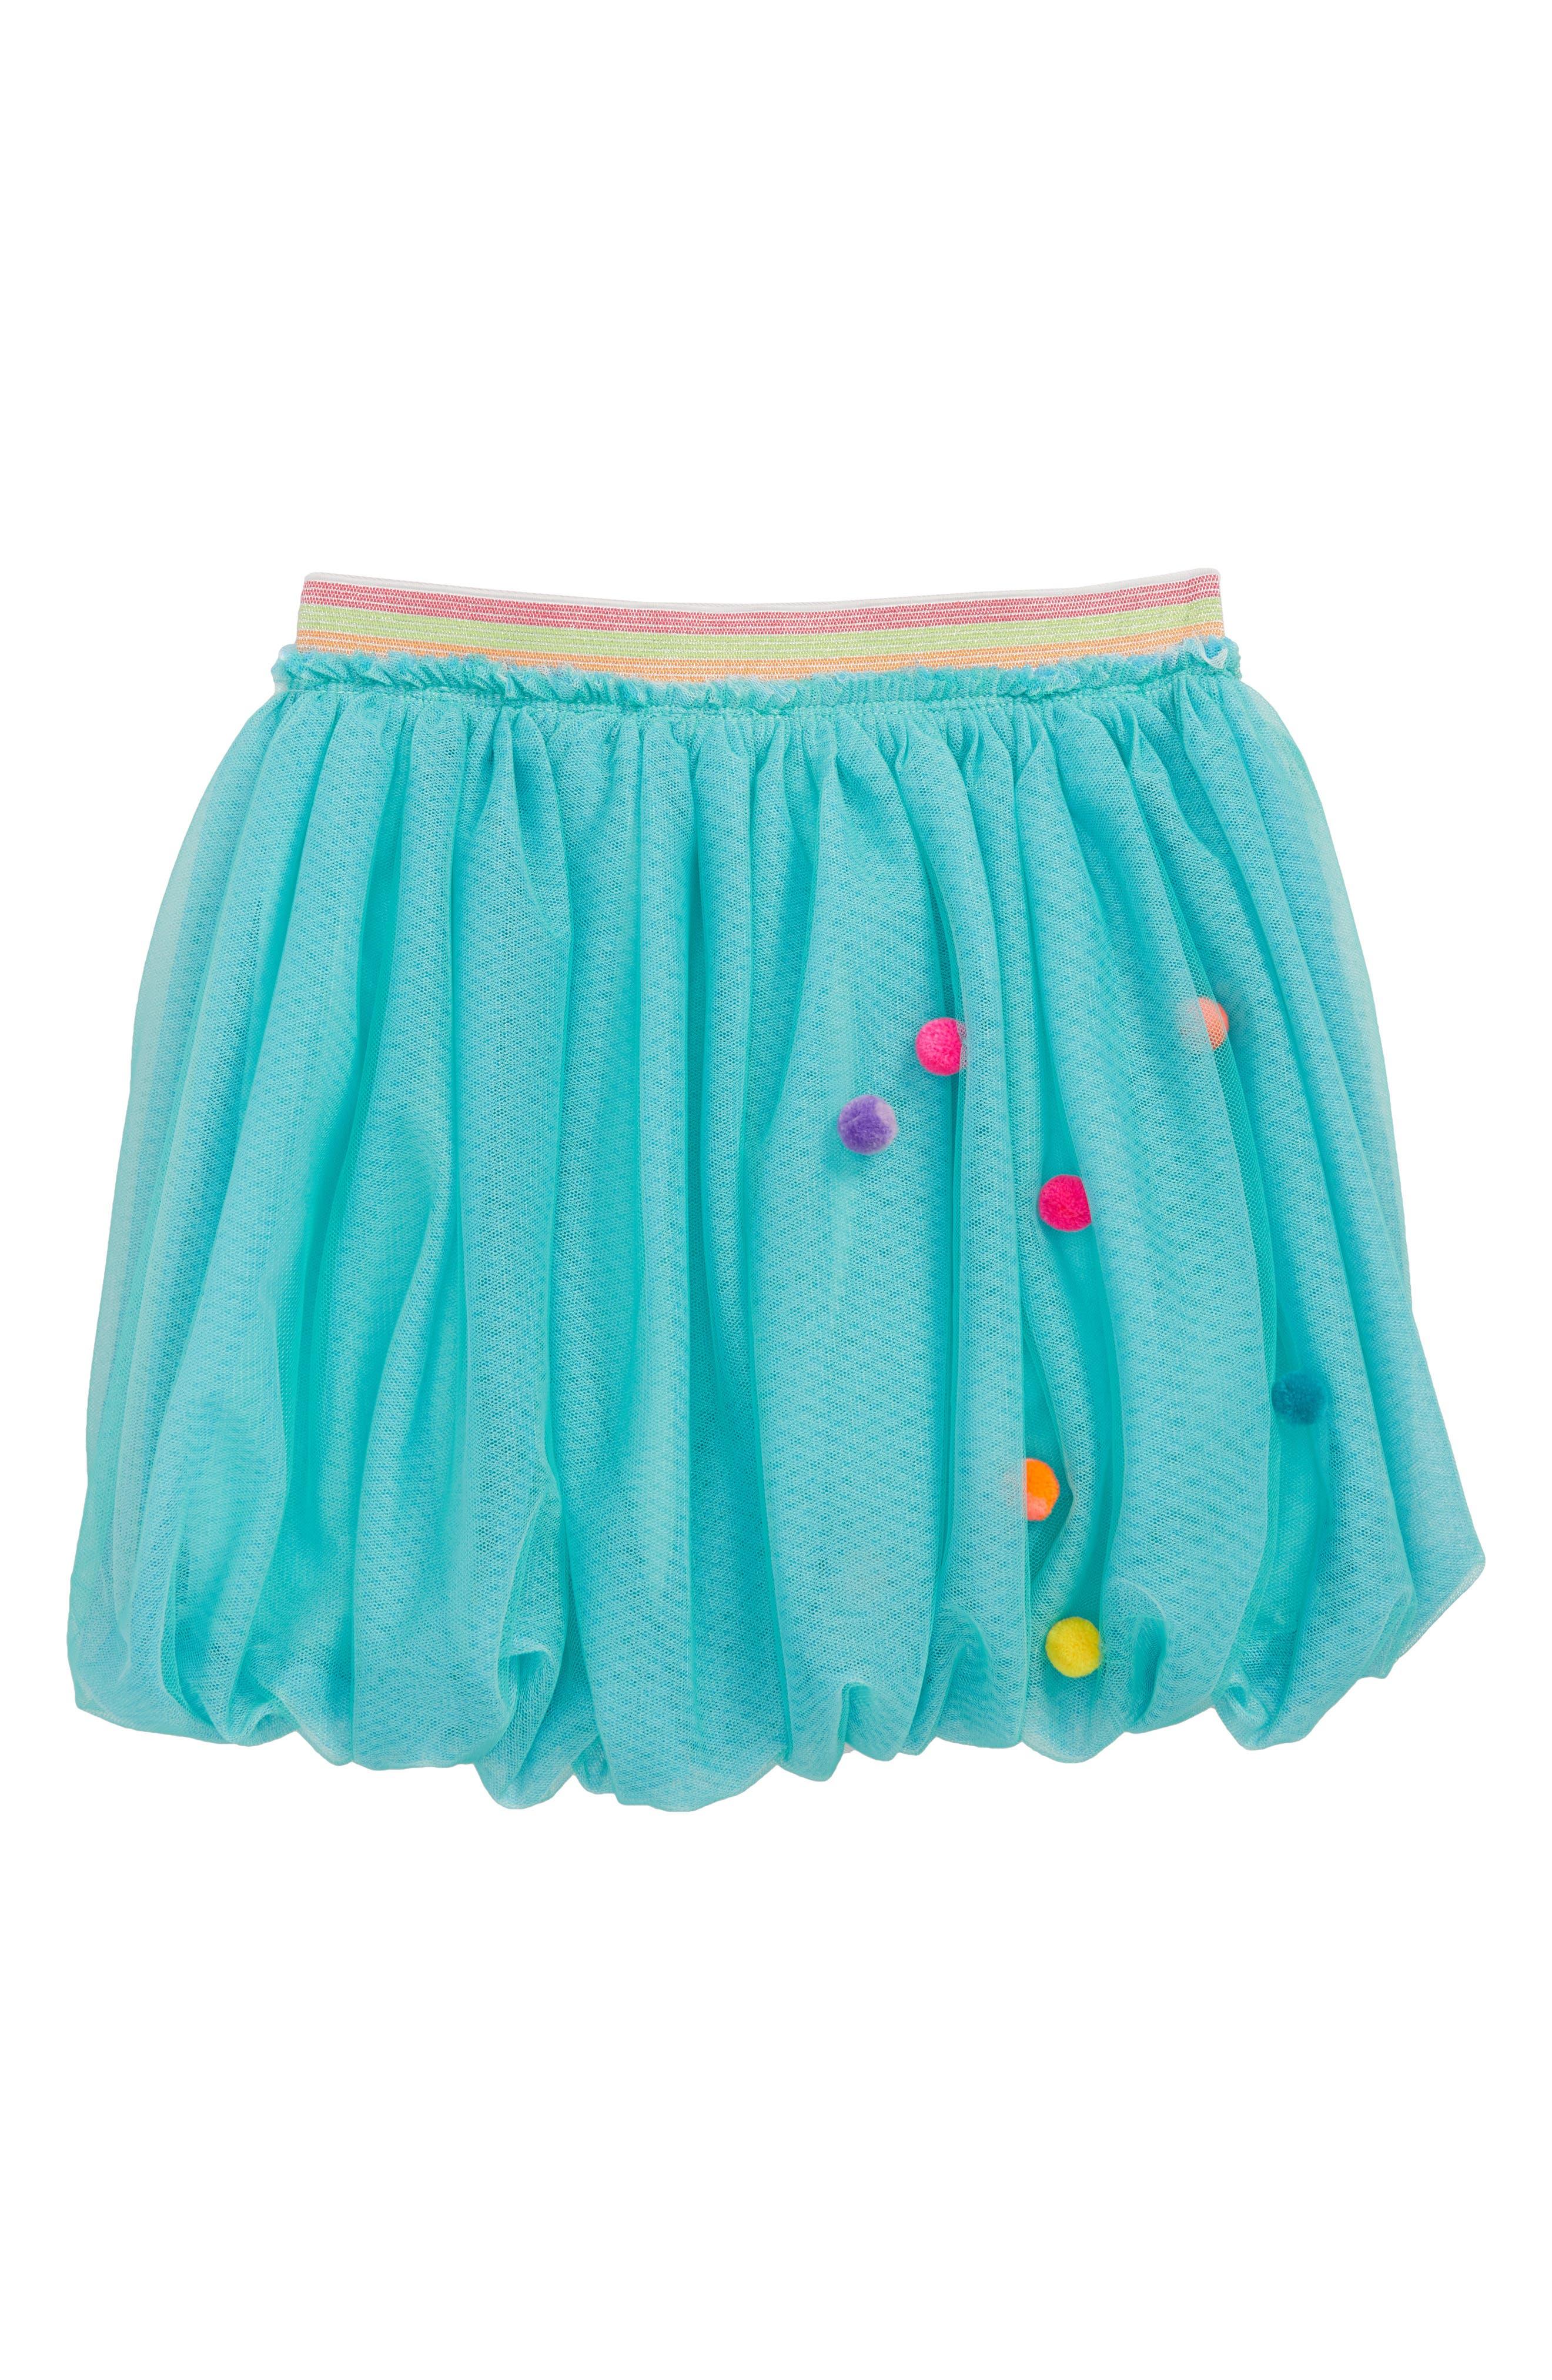 Pompom Bubble Tutu Skirt,                         Main,                         color, 400